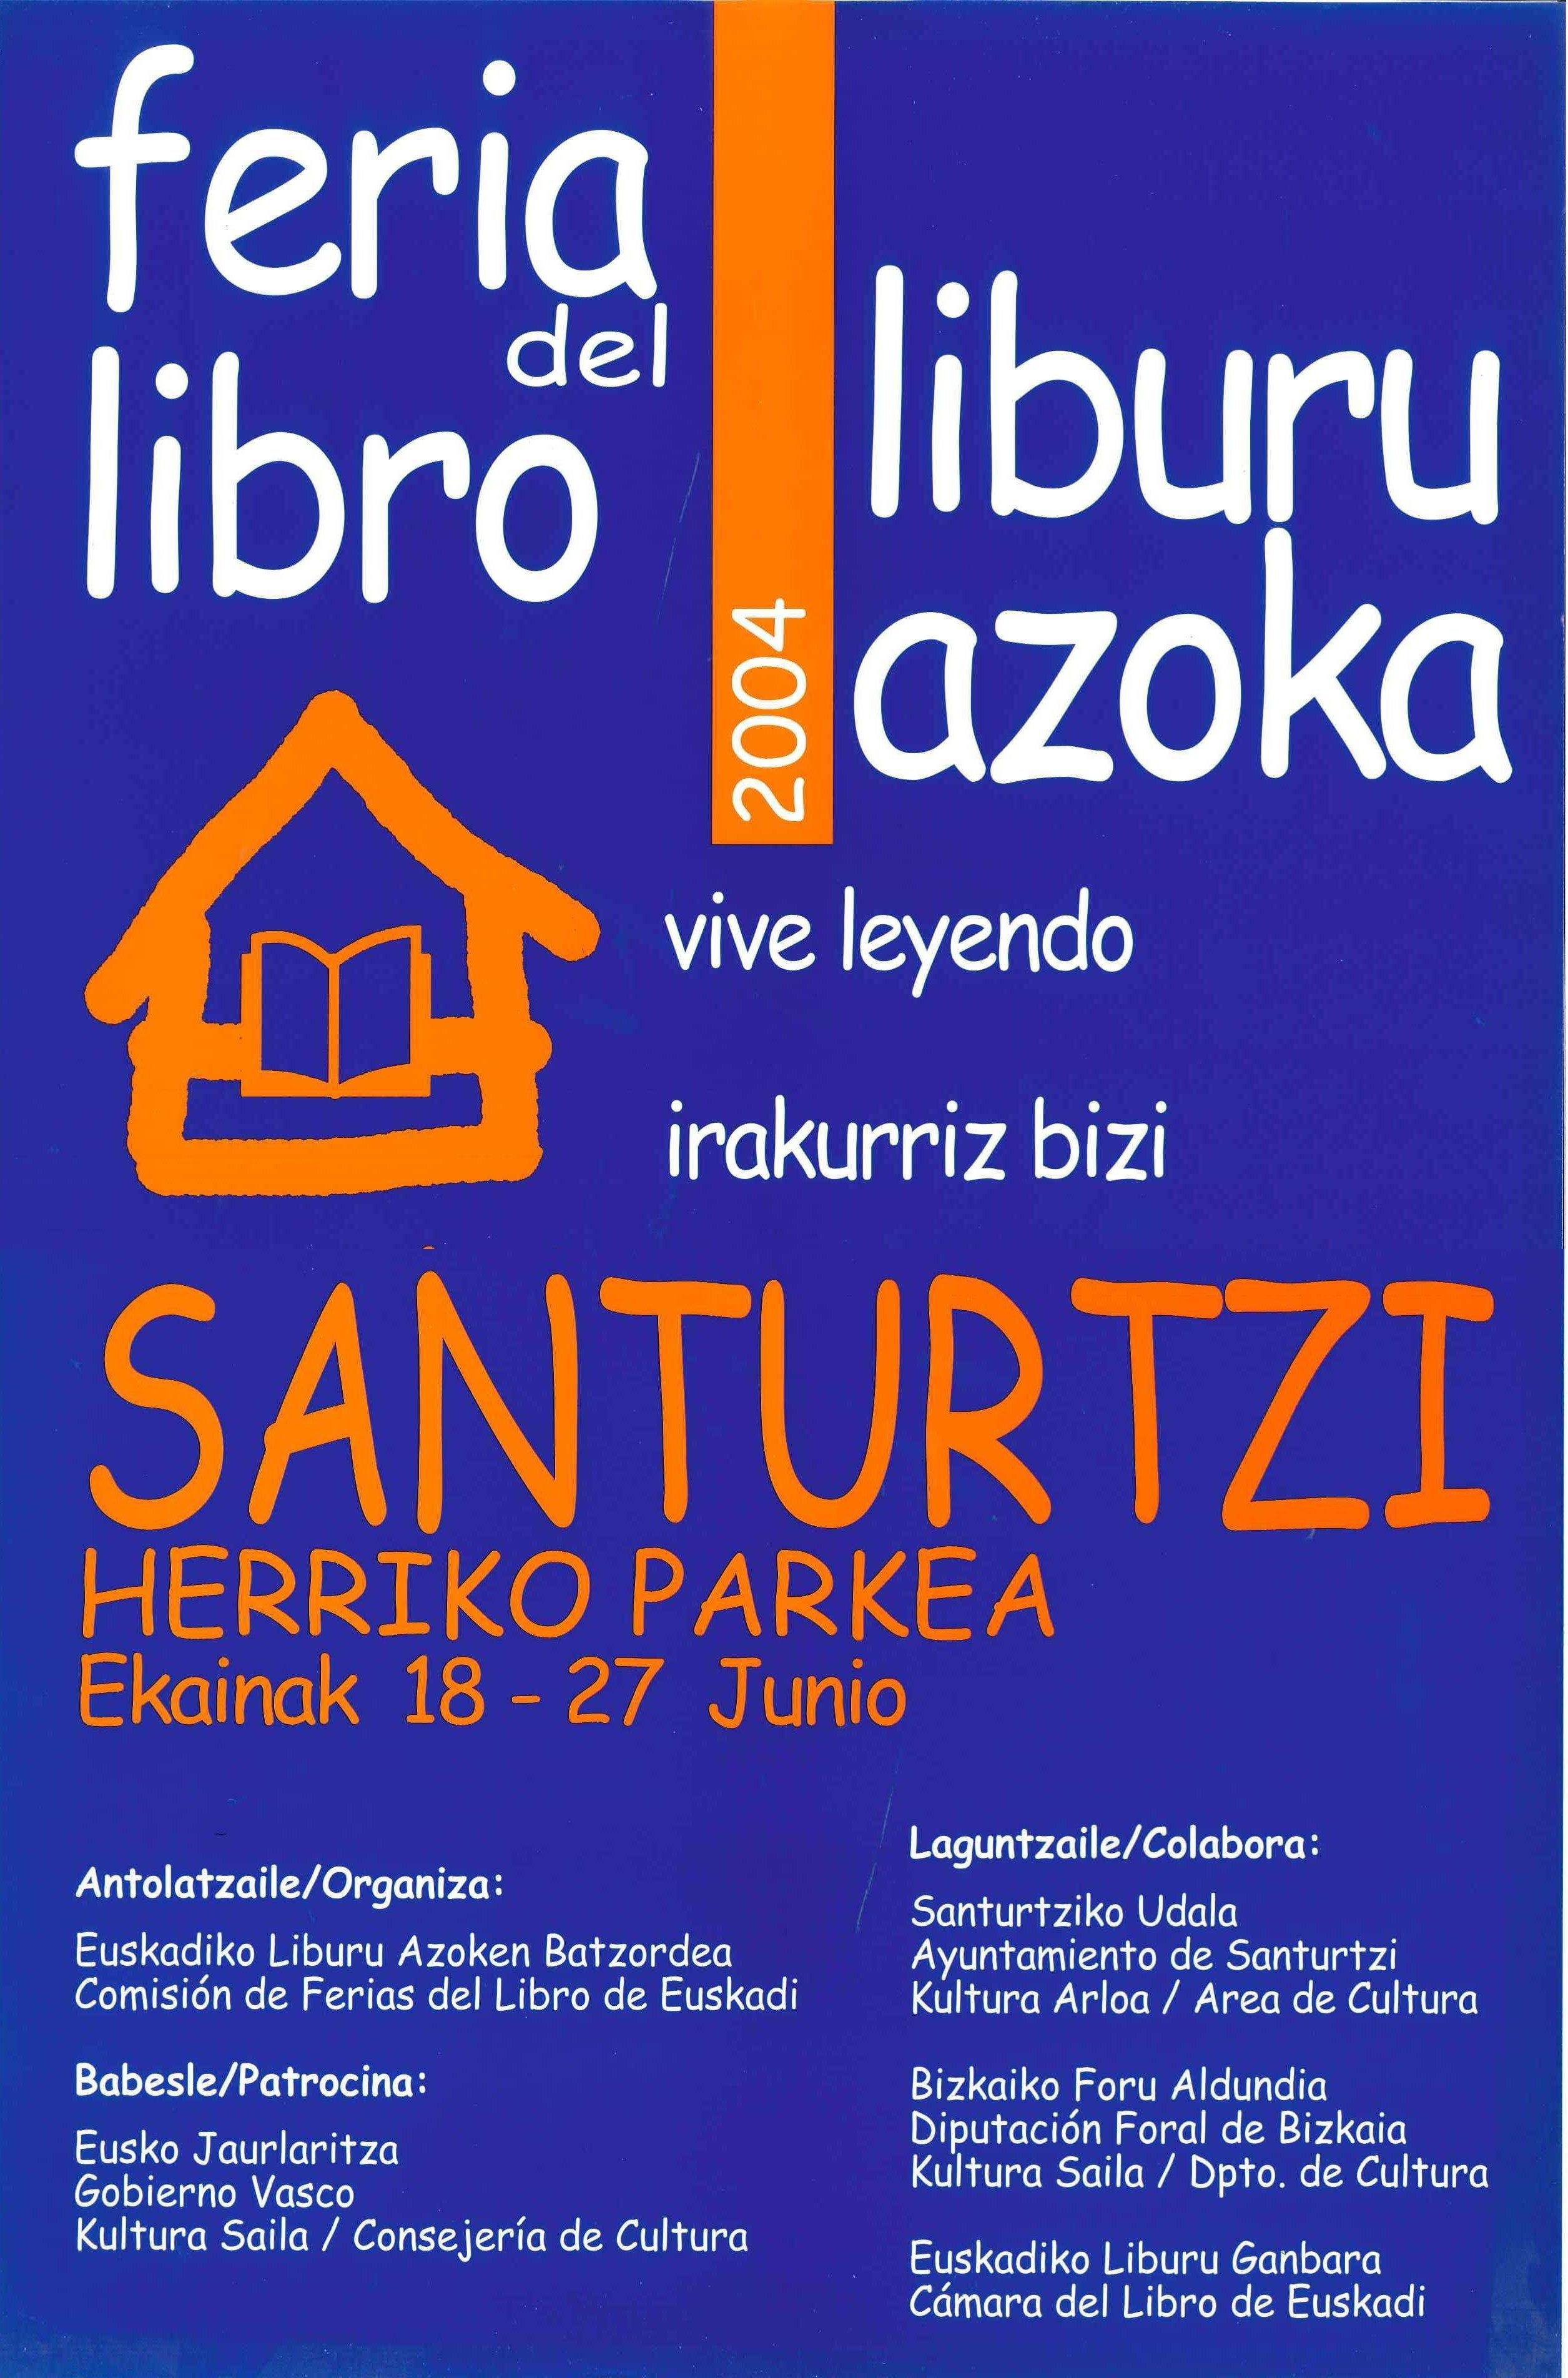 2004 cartel feria libro